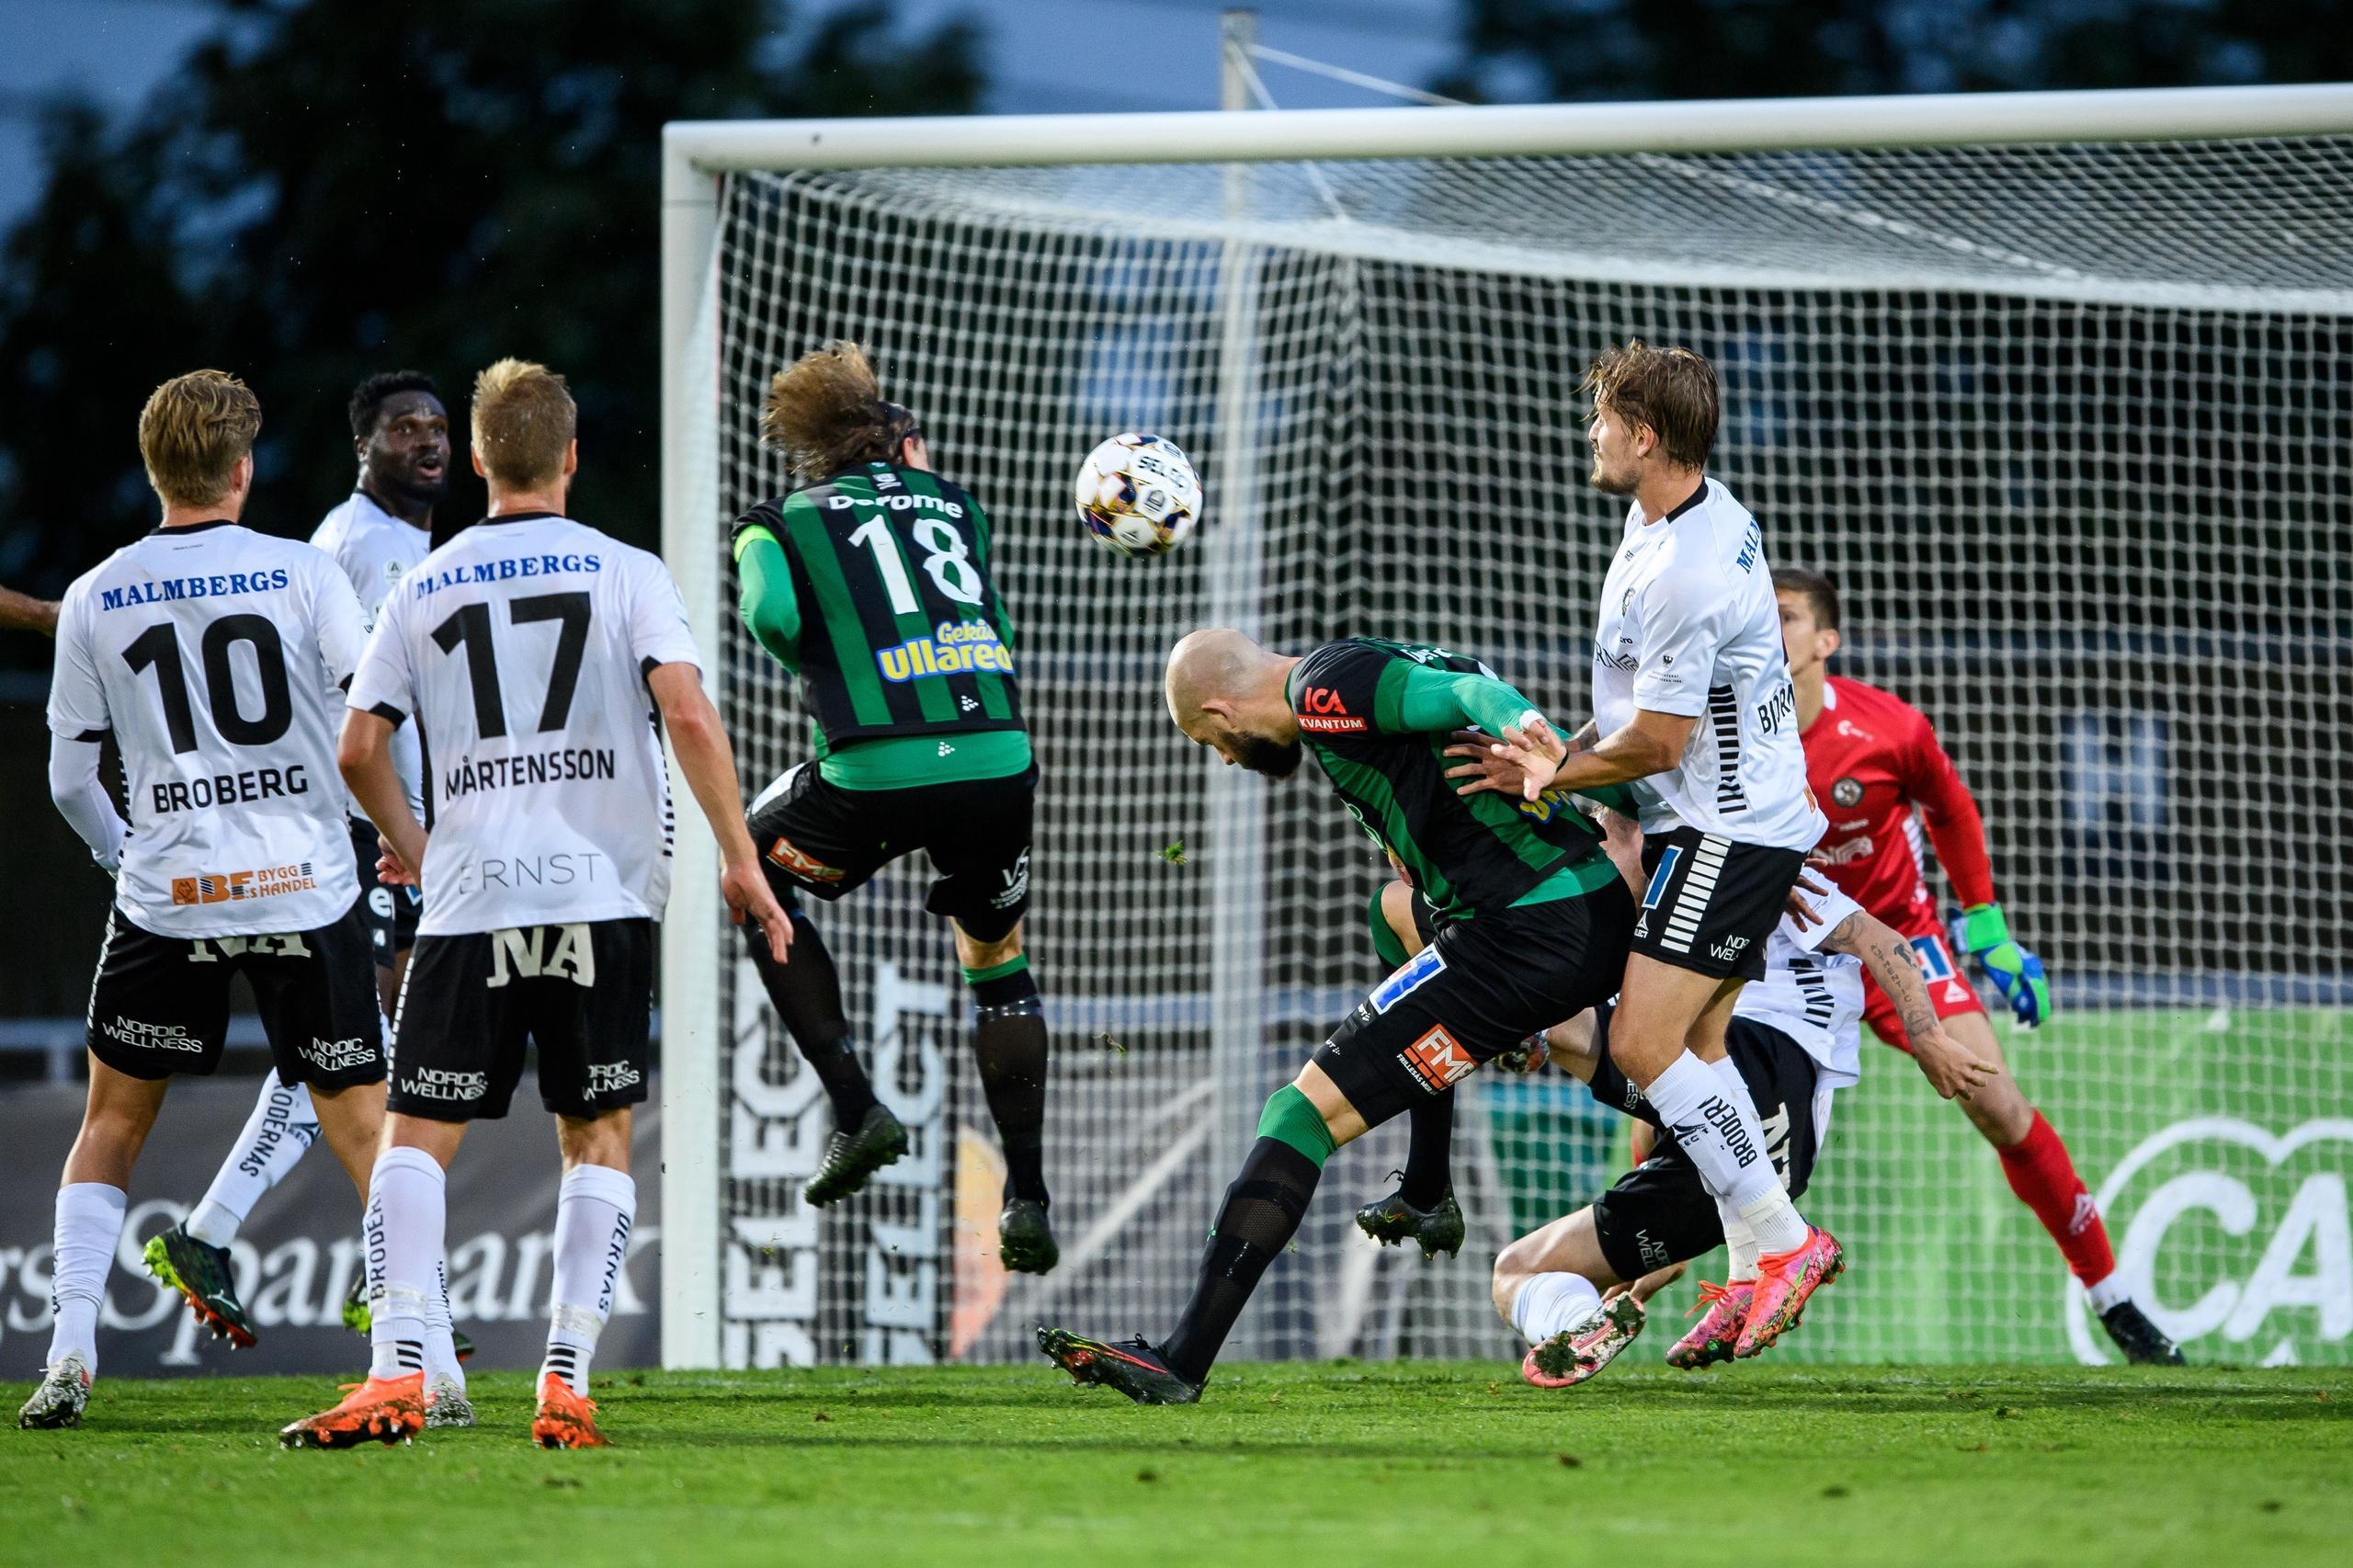 Varbergs Bois tog en sen seger mot Örebro SK